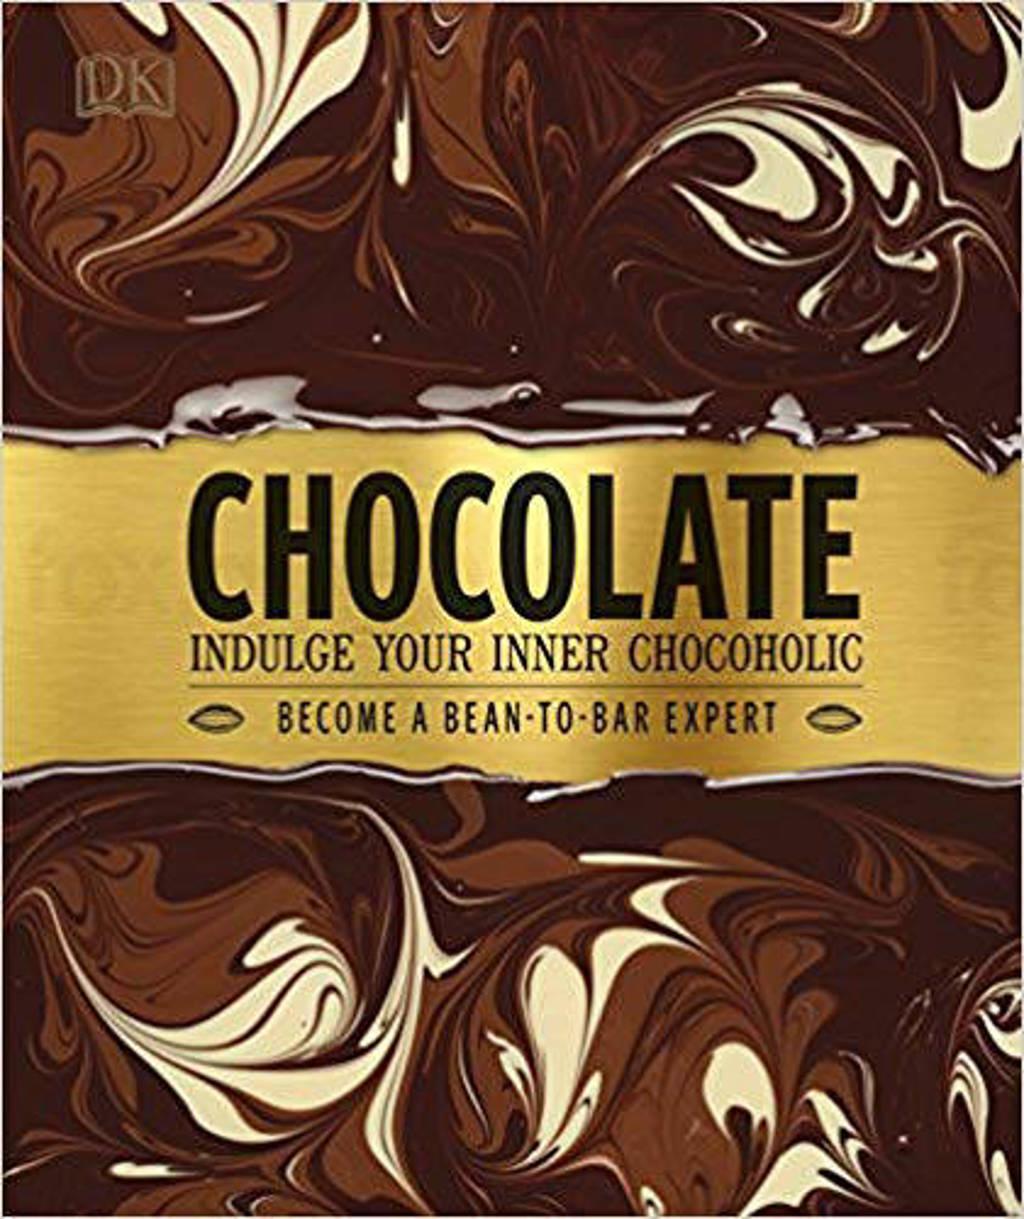 Chocolate - DK